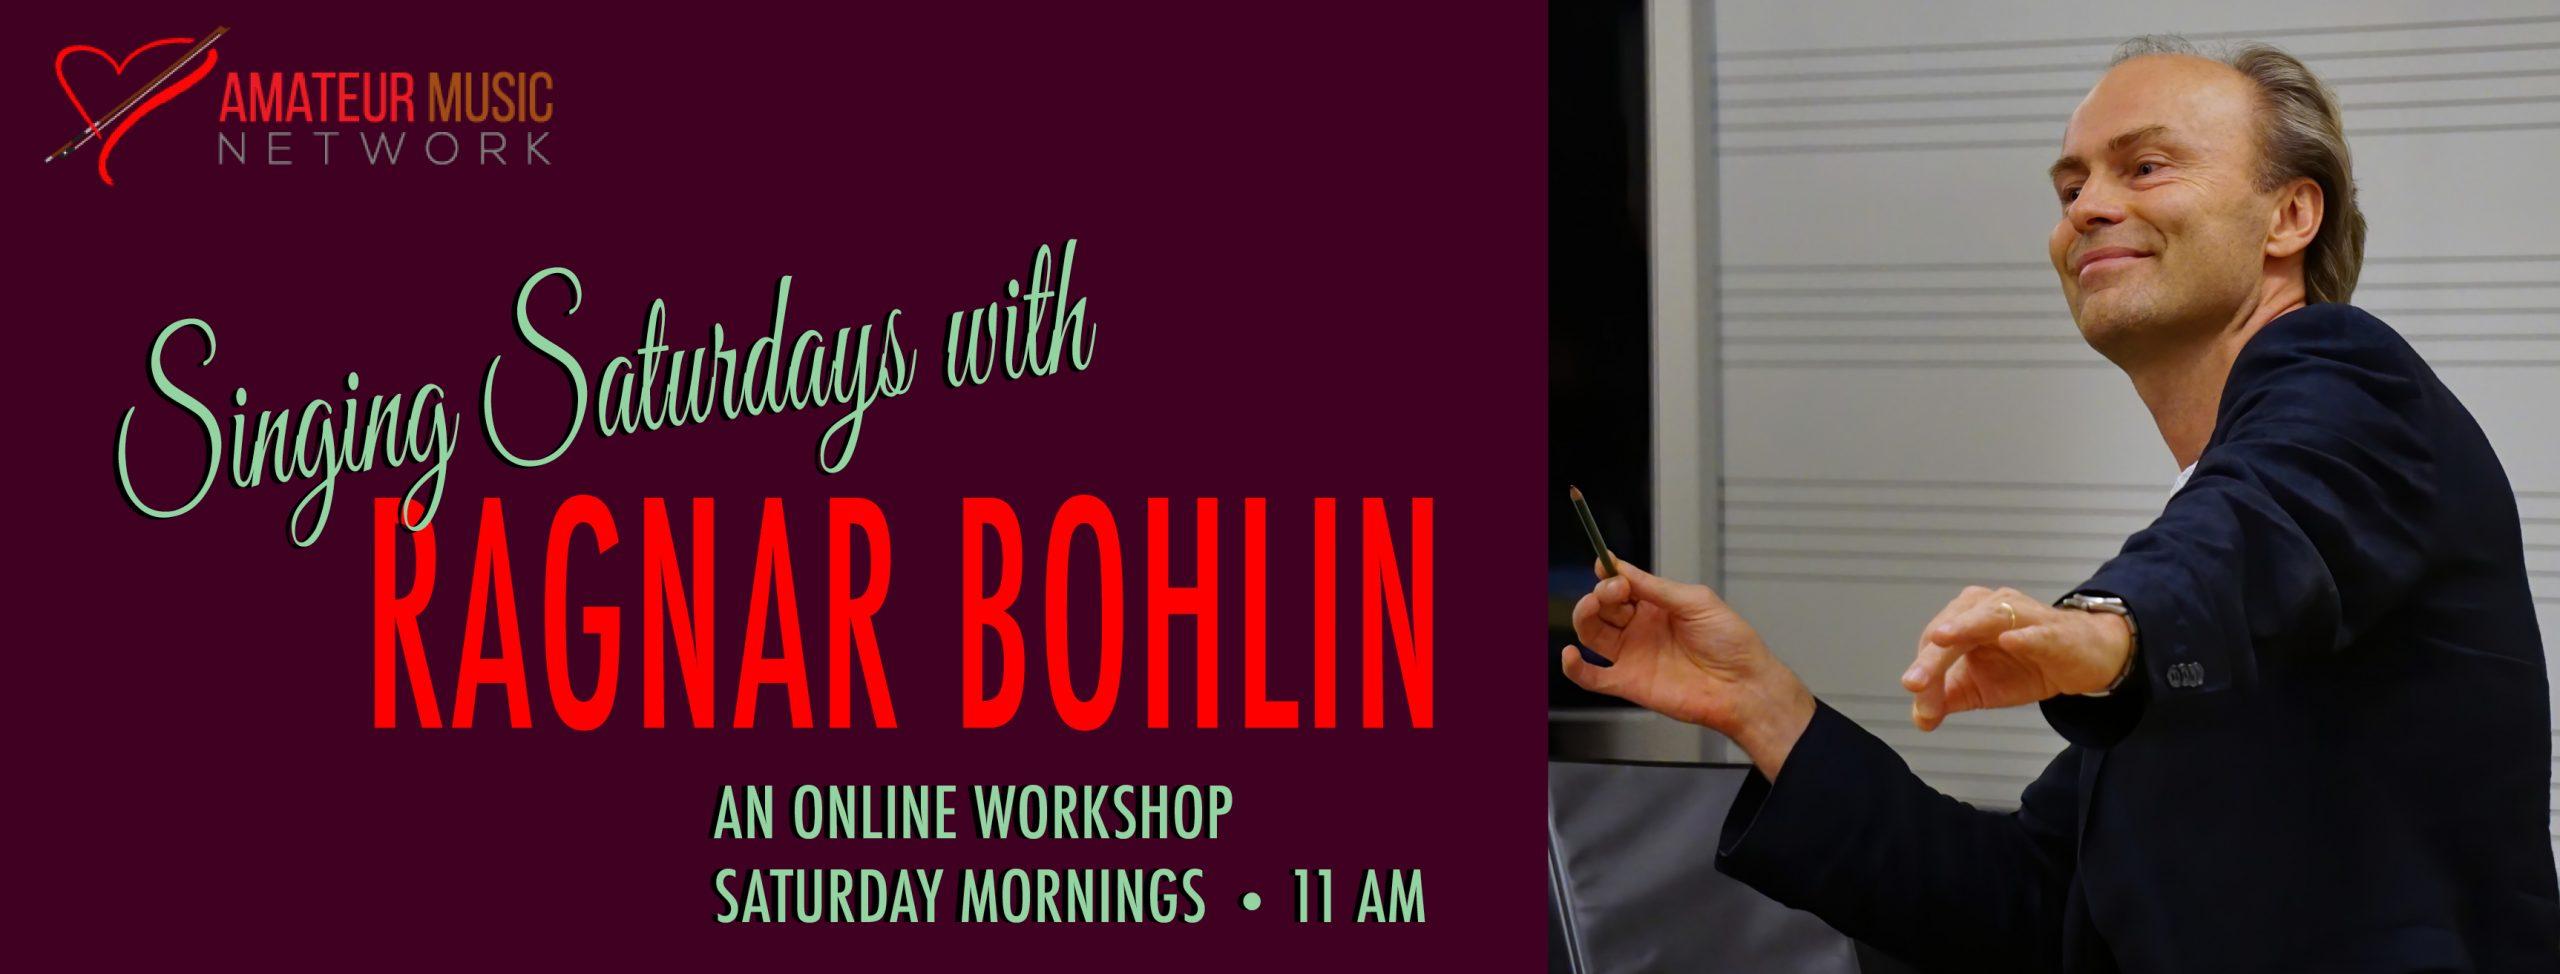 AMN Facebook slice_Ragnar Bohlin Singing Saturdays